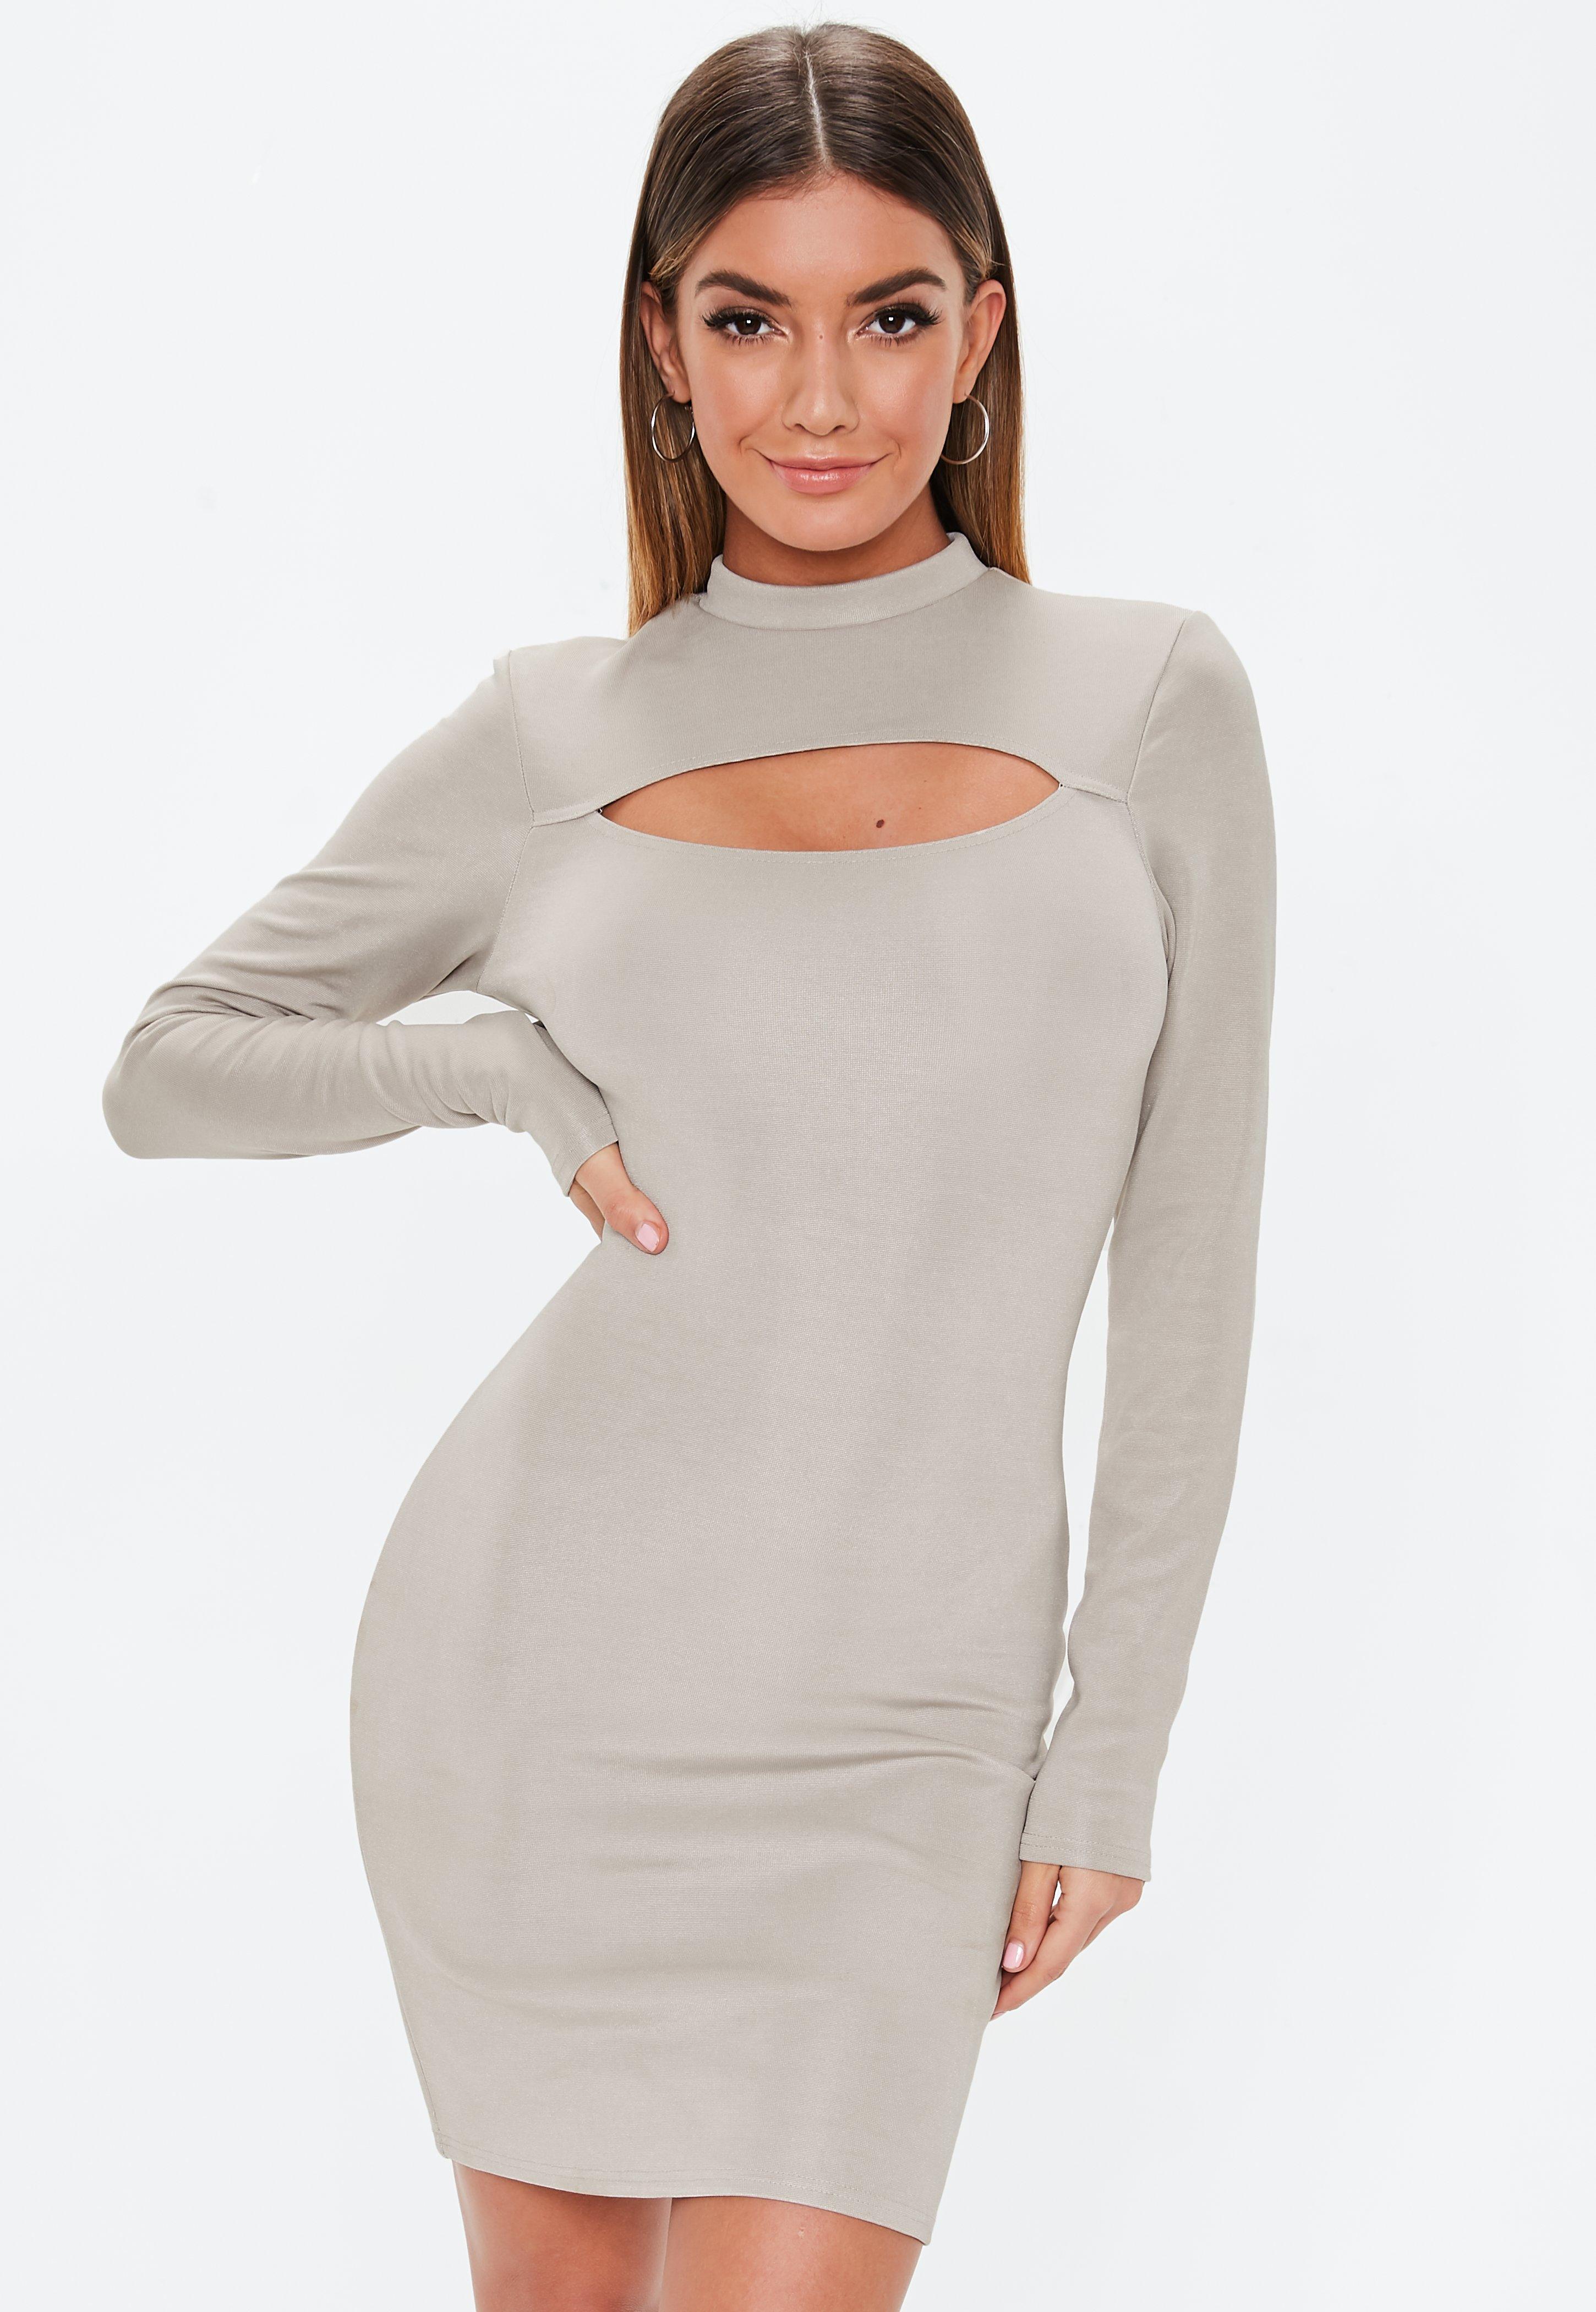 0d3da5e02 Vestidos ceñidos